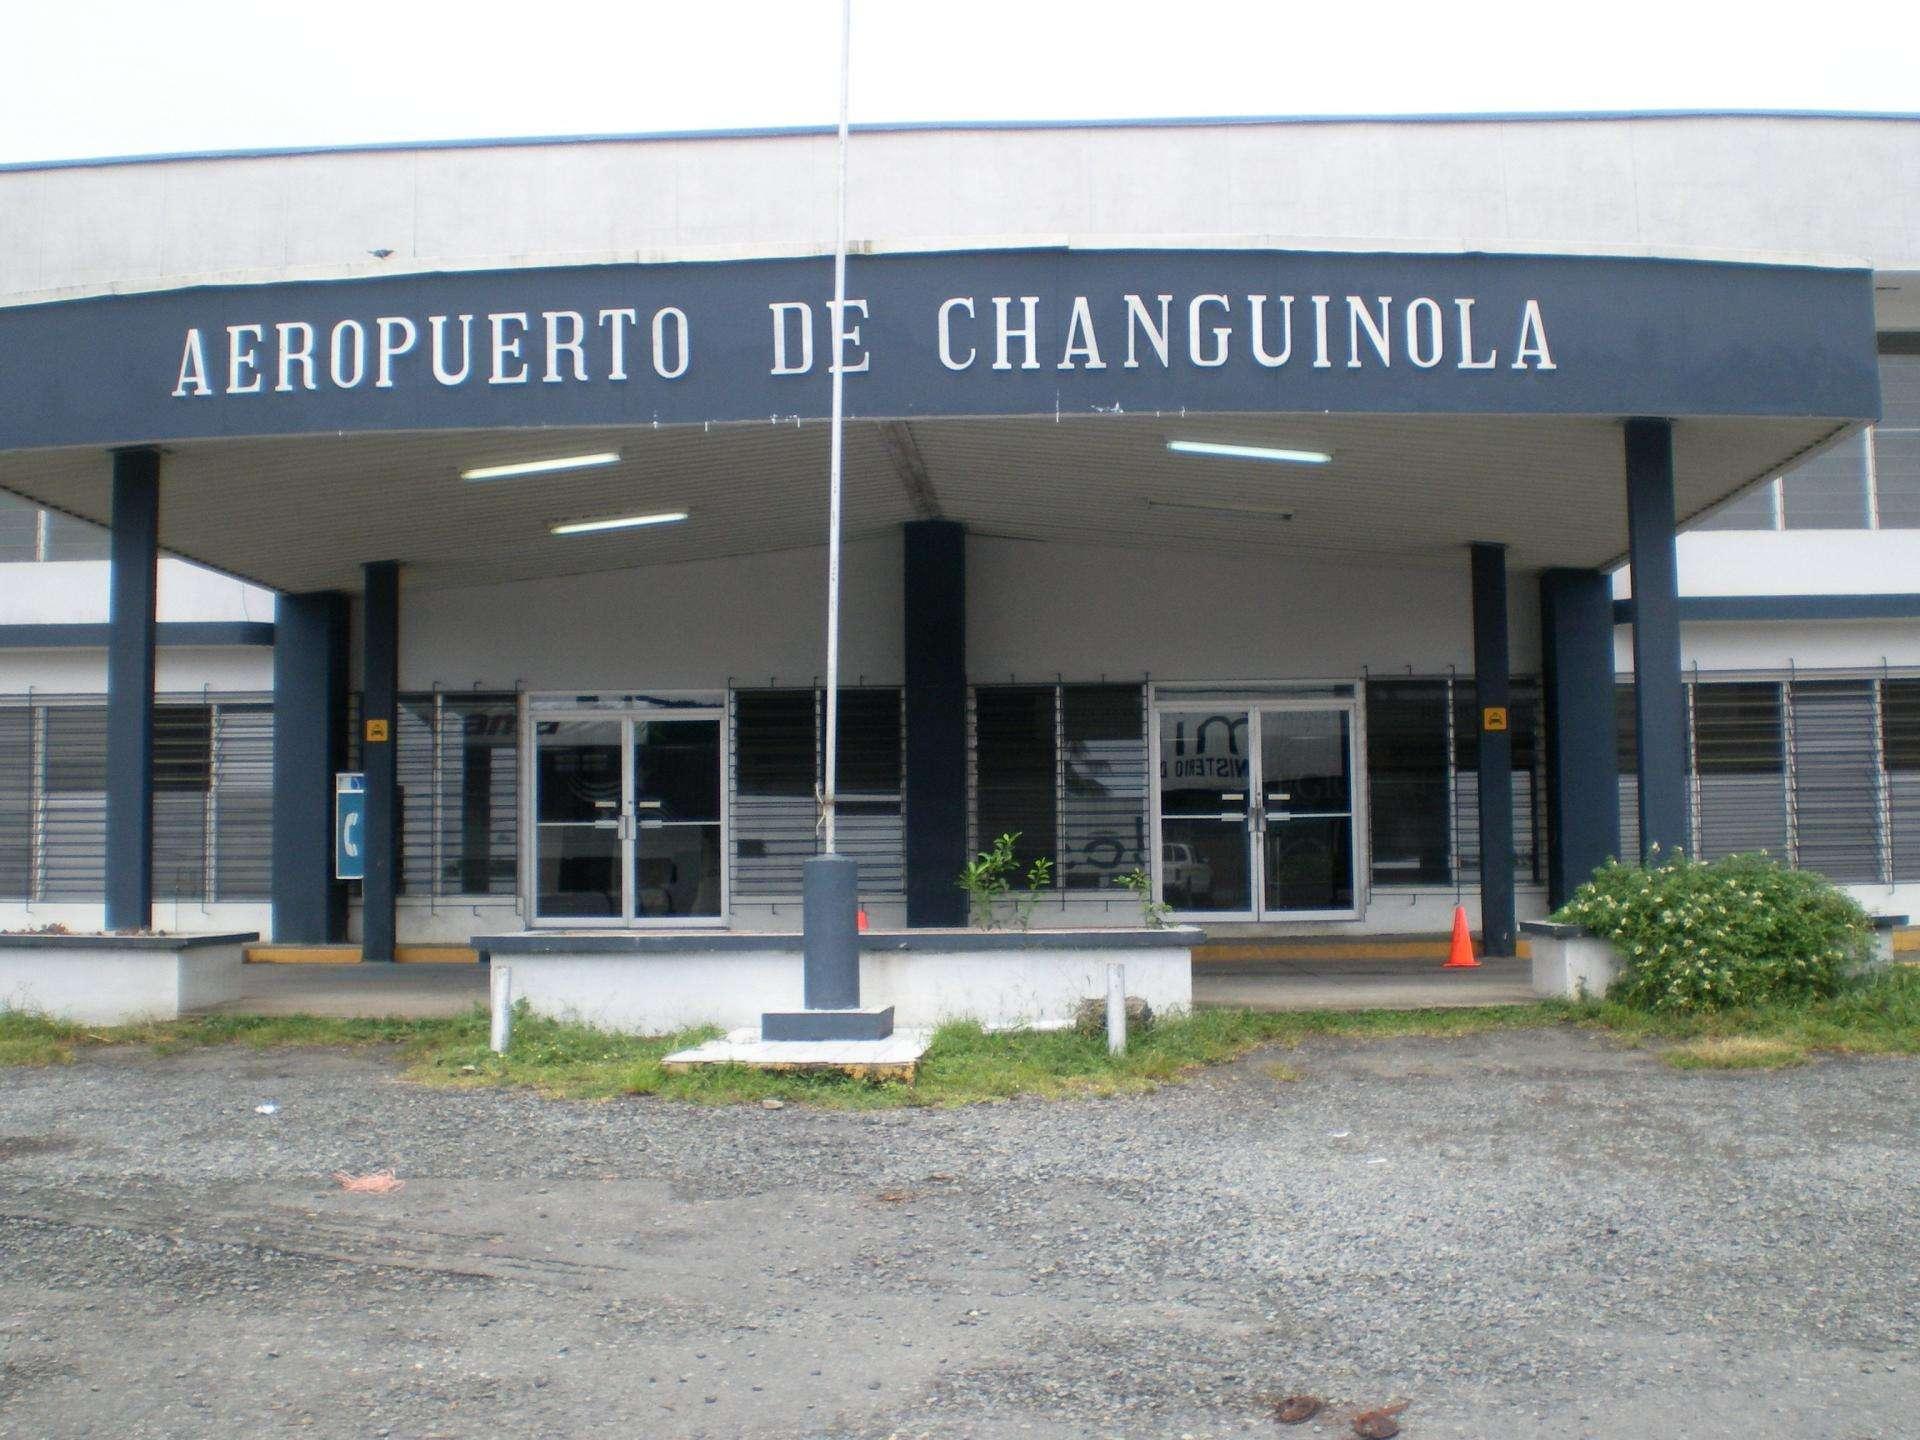 https://www.biocaribecostarica.com/wp-content/uploads/2017/05/changuinola.jpg